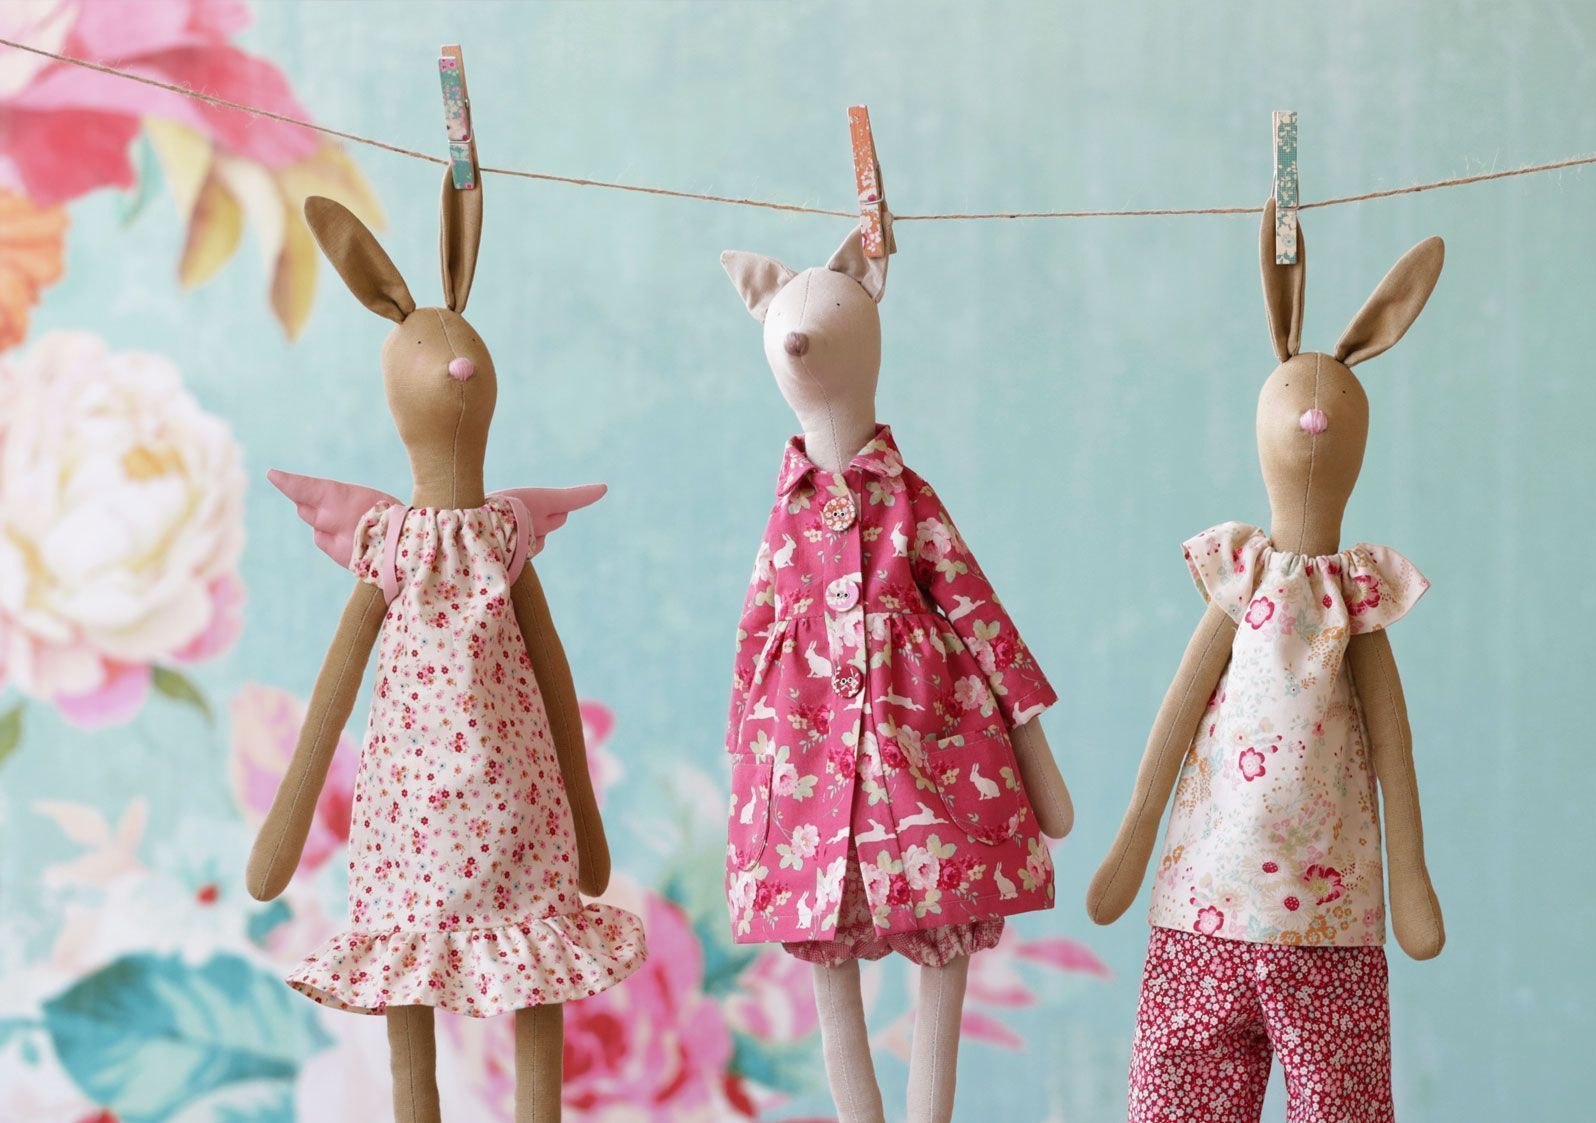 Clothespins-2